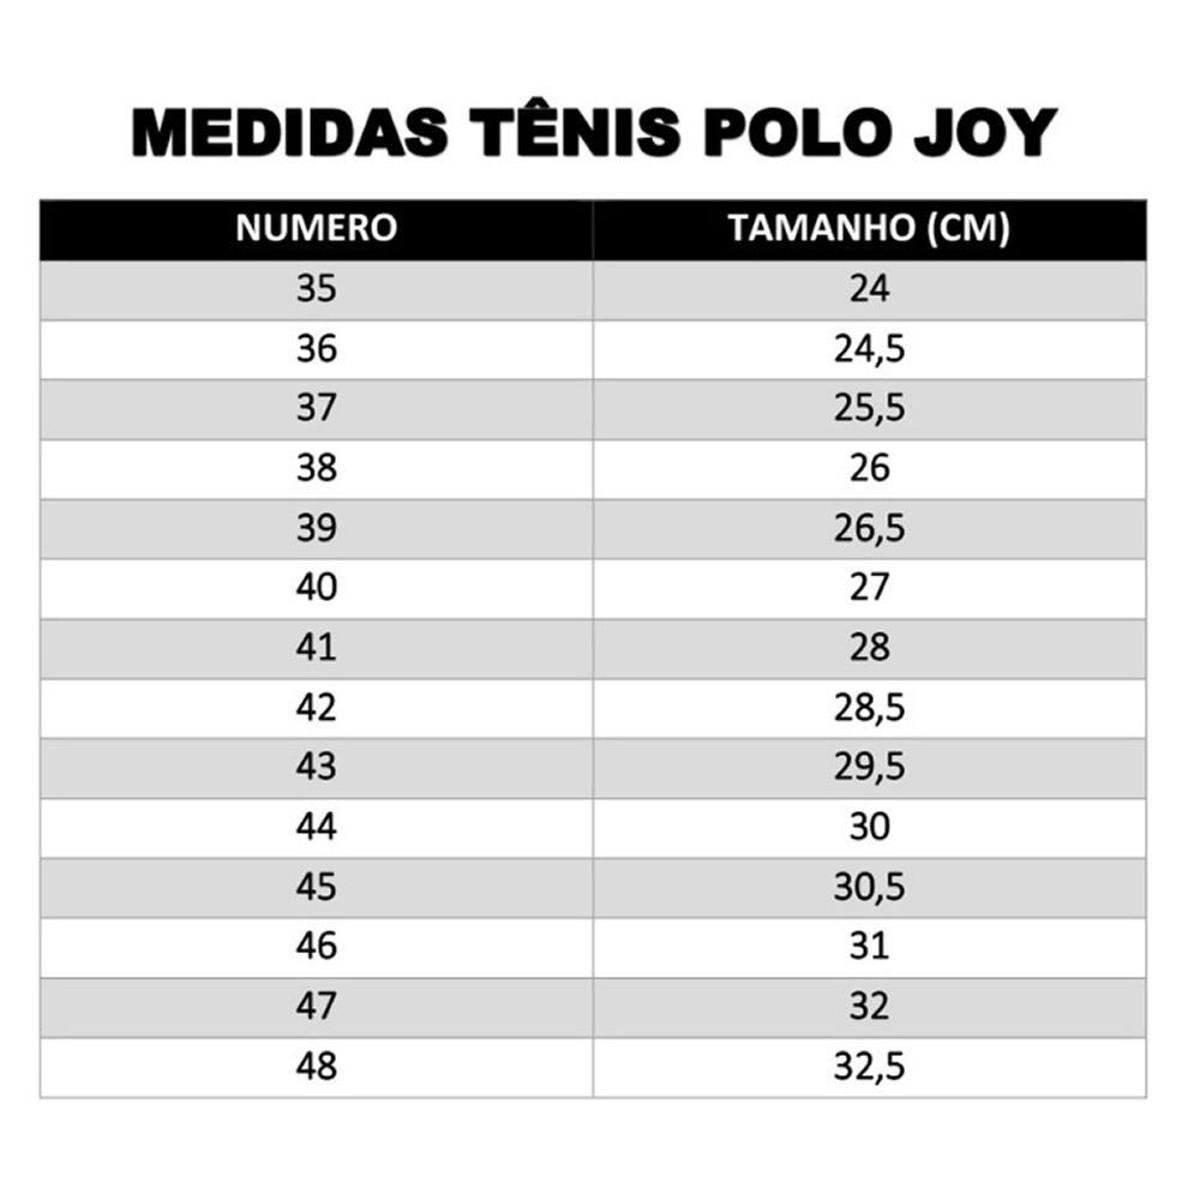 Joy On Slip Tênis Iate Tênis Marinho Polo Masculino Polo 6xcqt1X